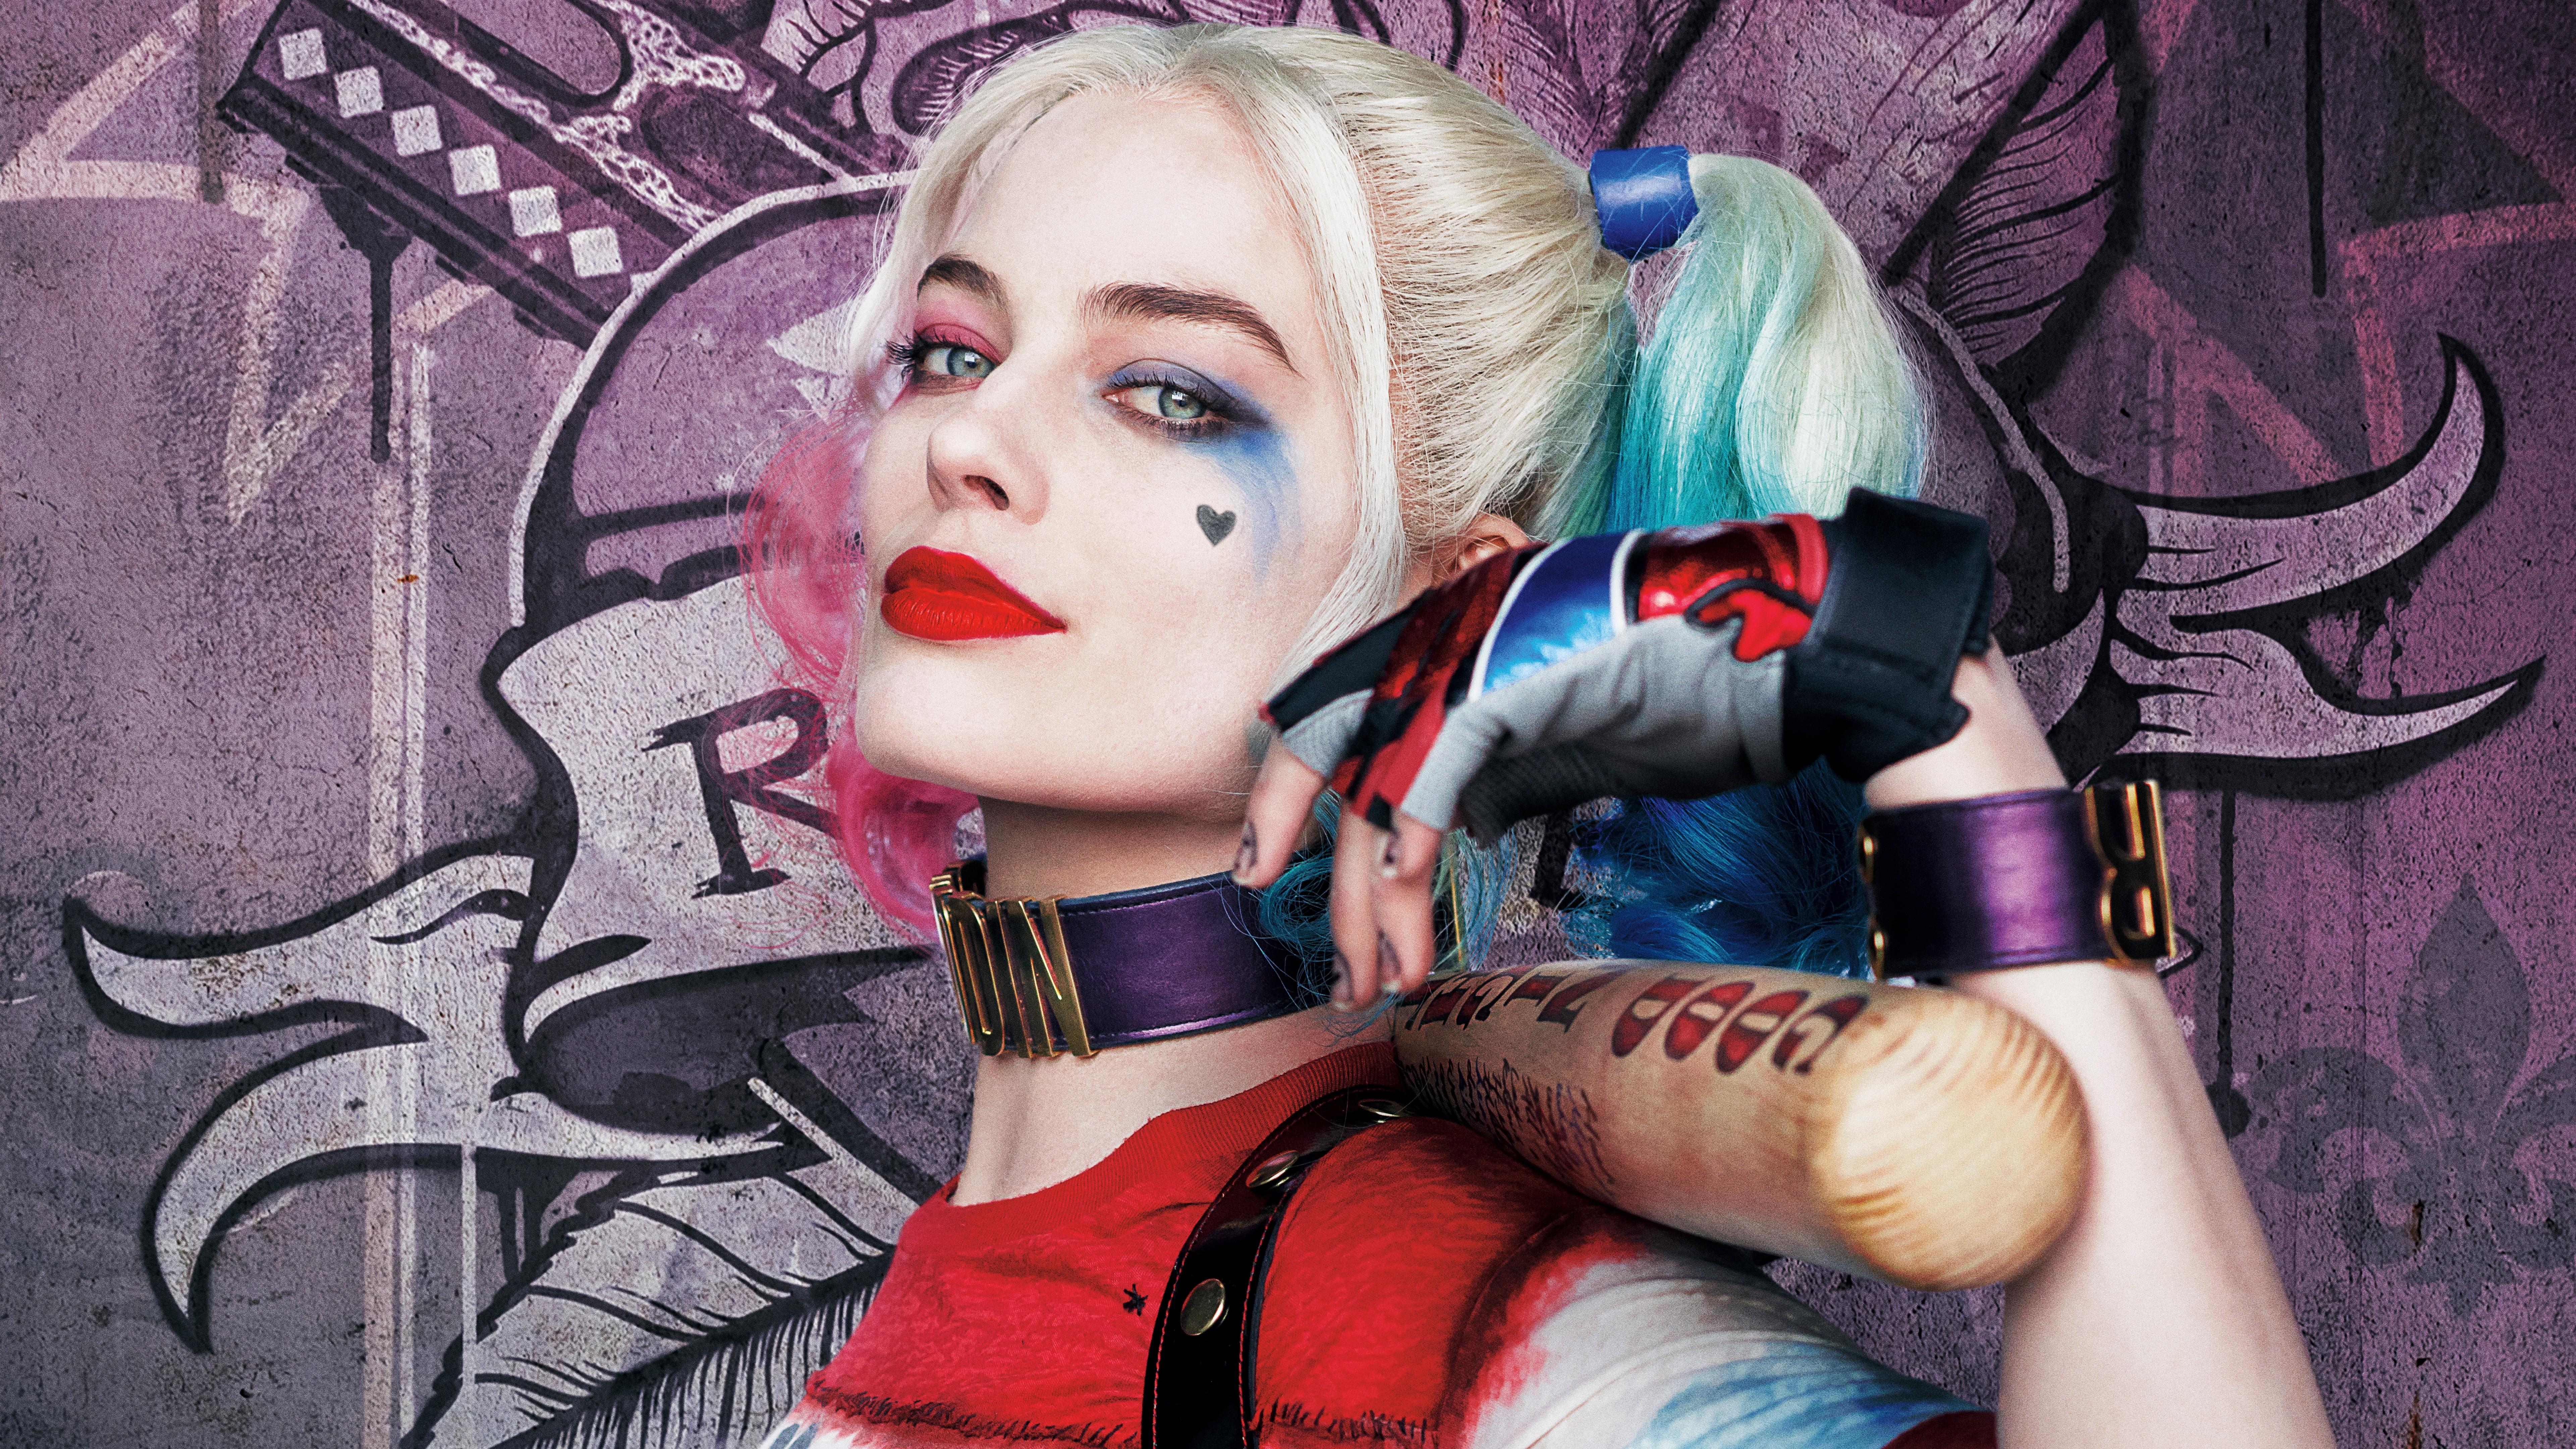 Margot Robbie as Harley Quinn 8k Ultra HD Wallpaper Background 7680x4320